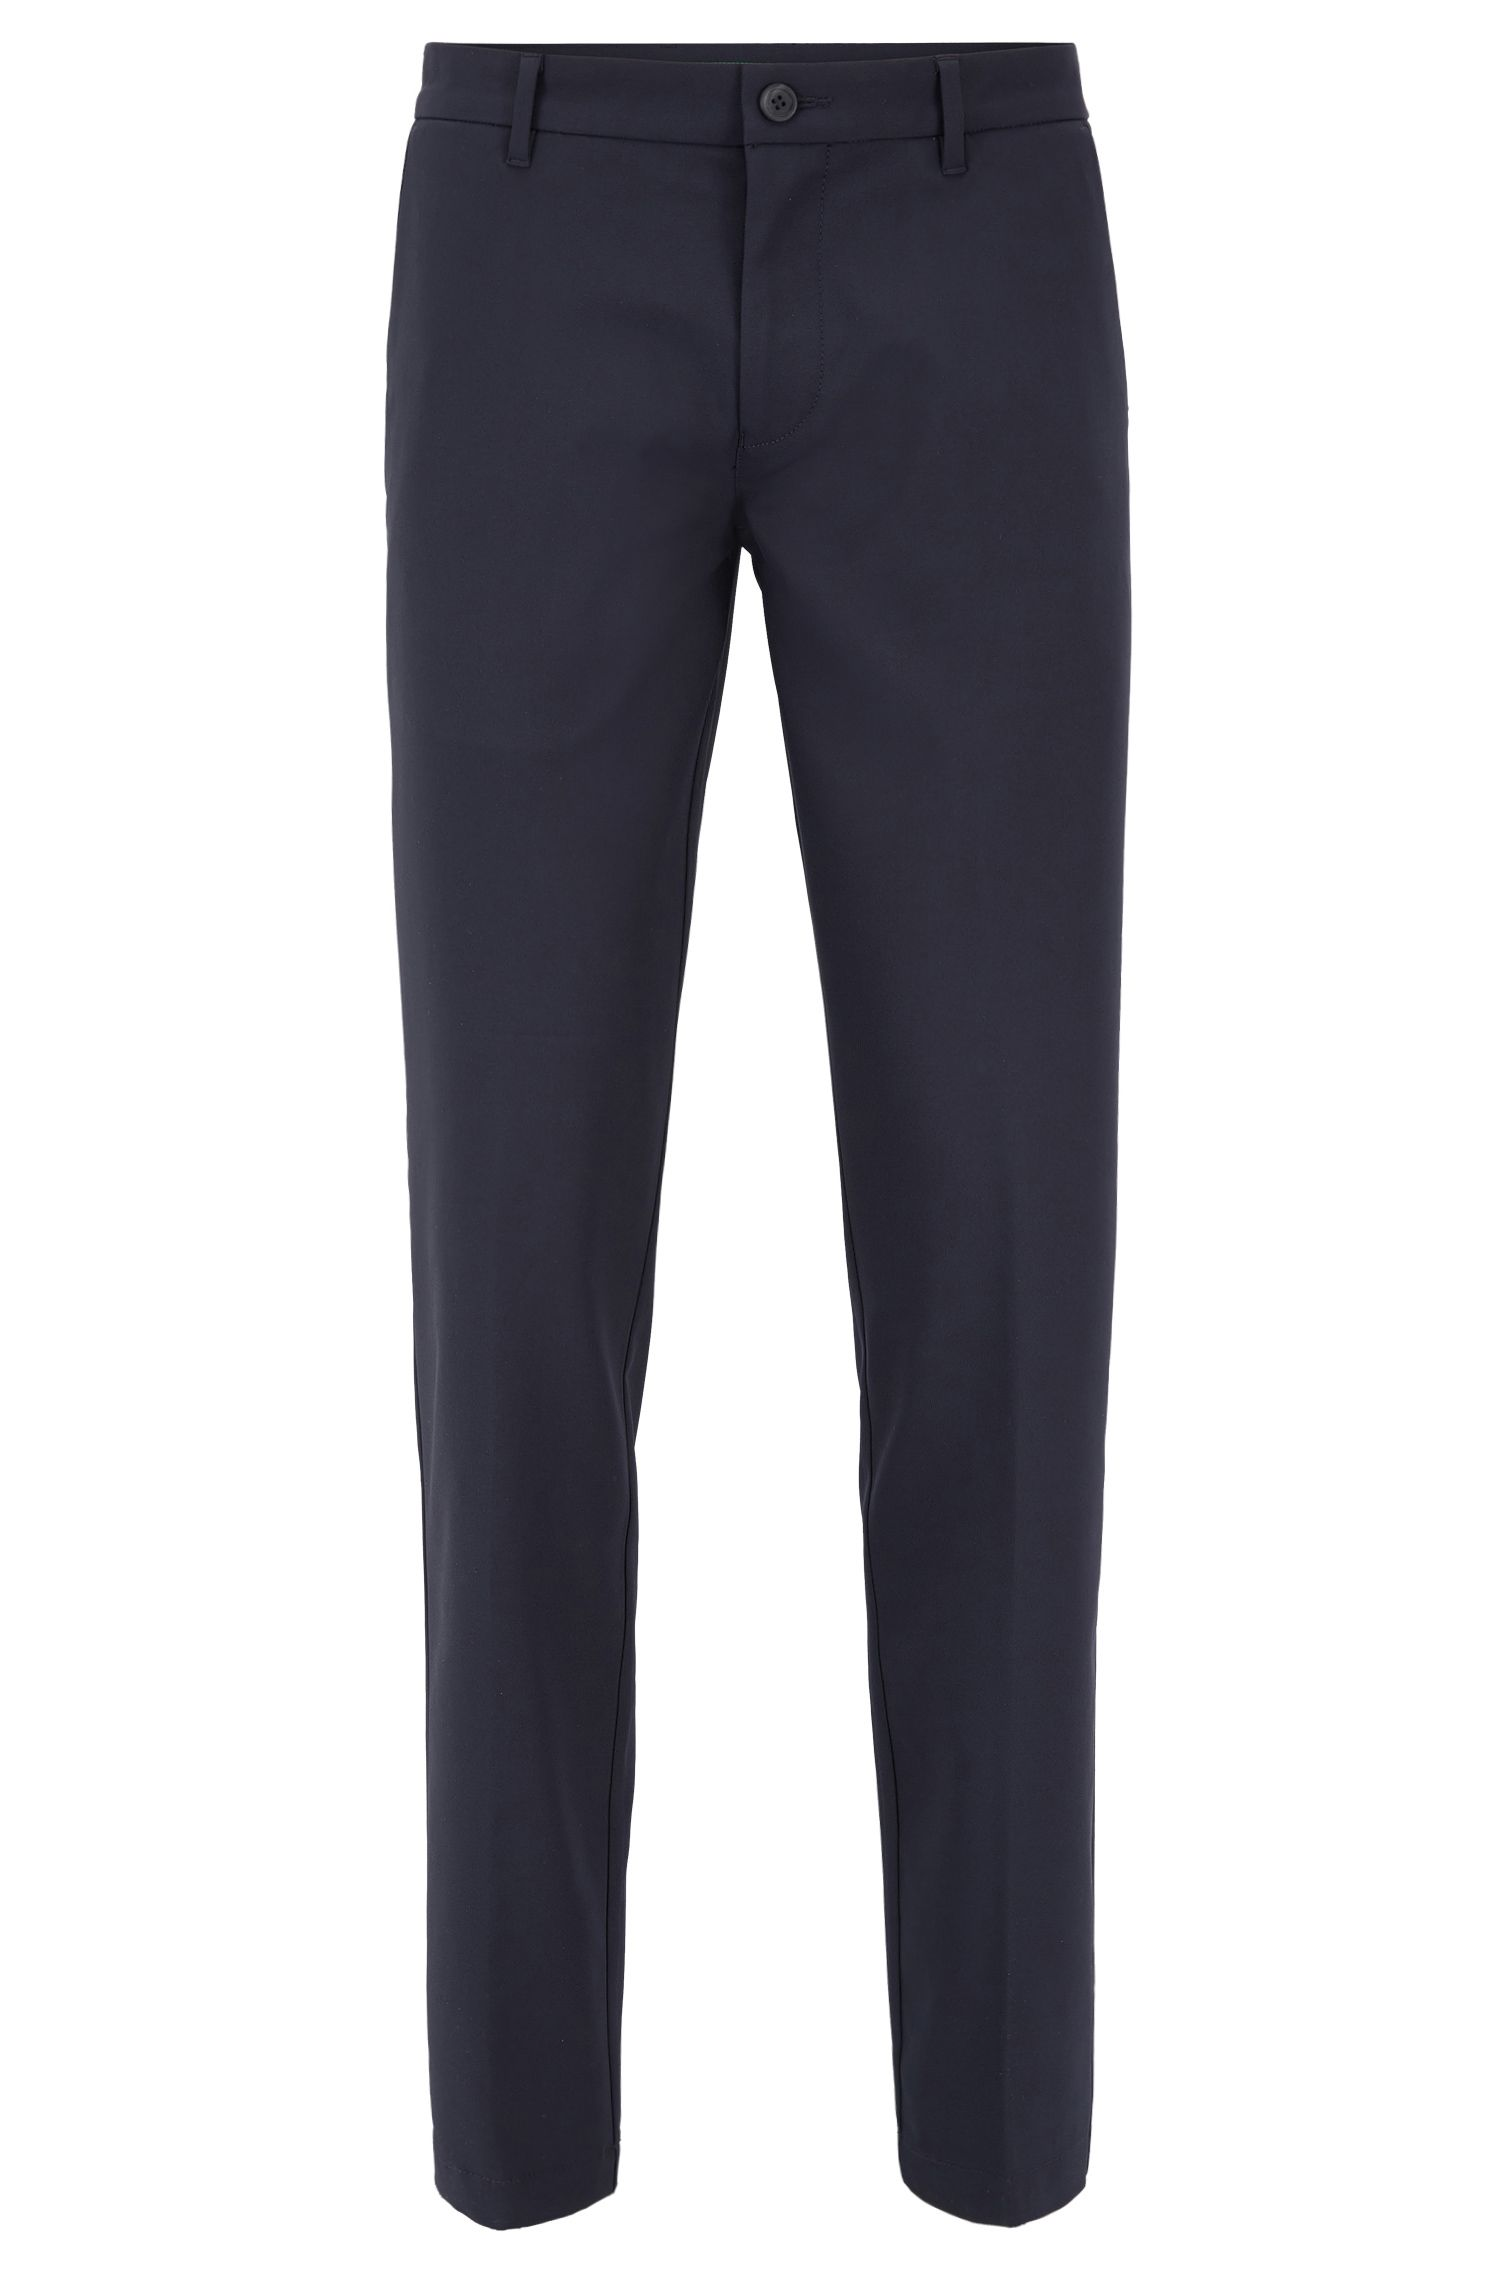 Pantalon Extra Slim Fit en tissu technique